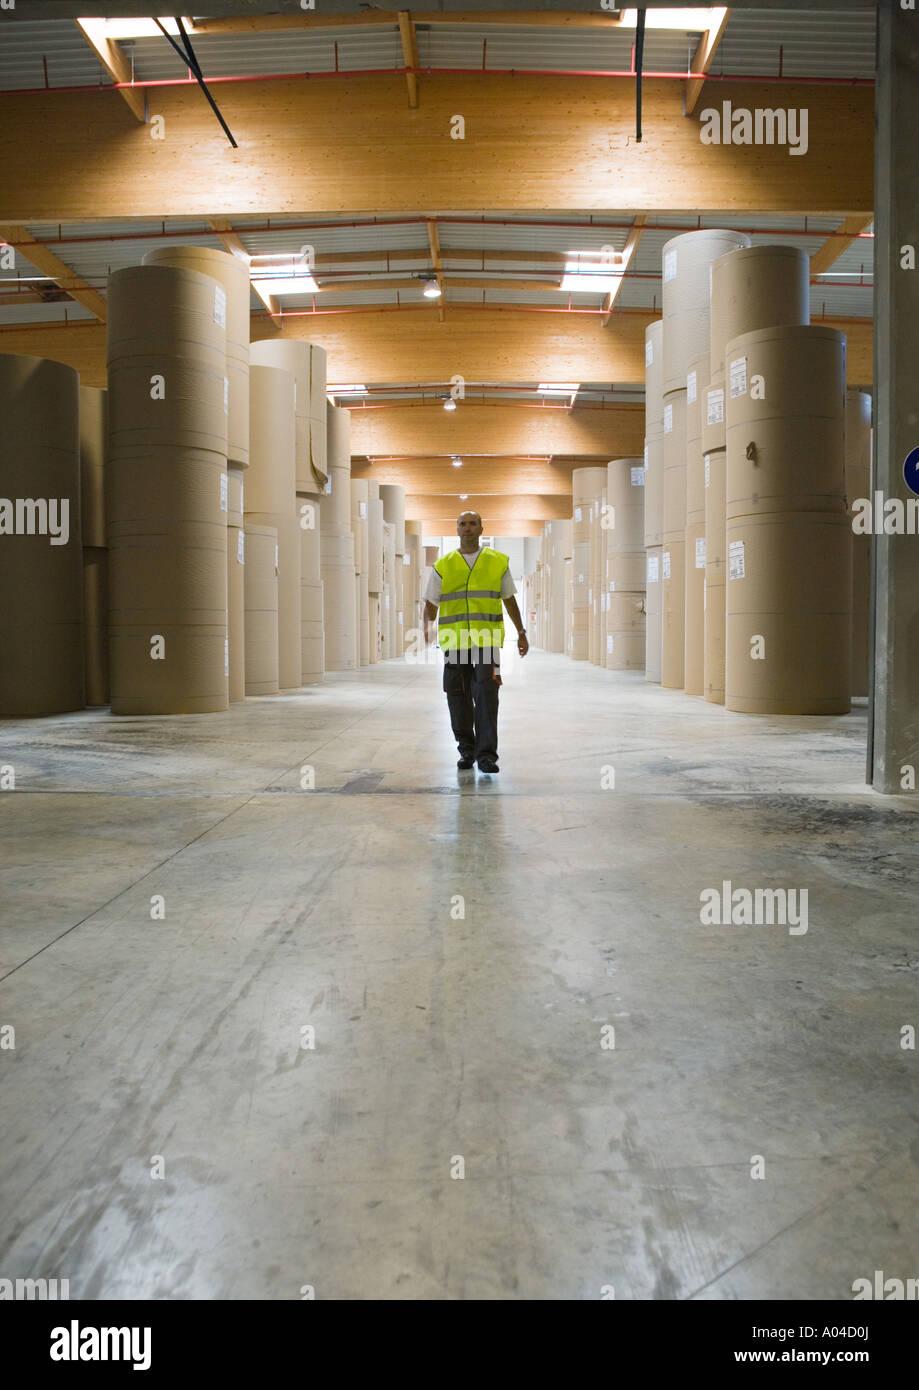 Man walking through rolls of paper in warehouse - Stock Image